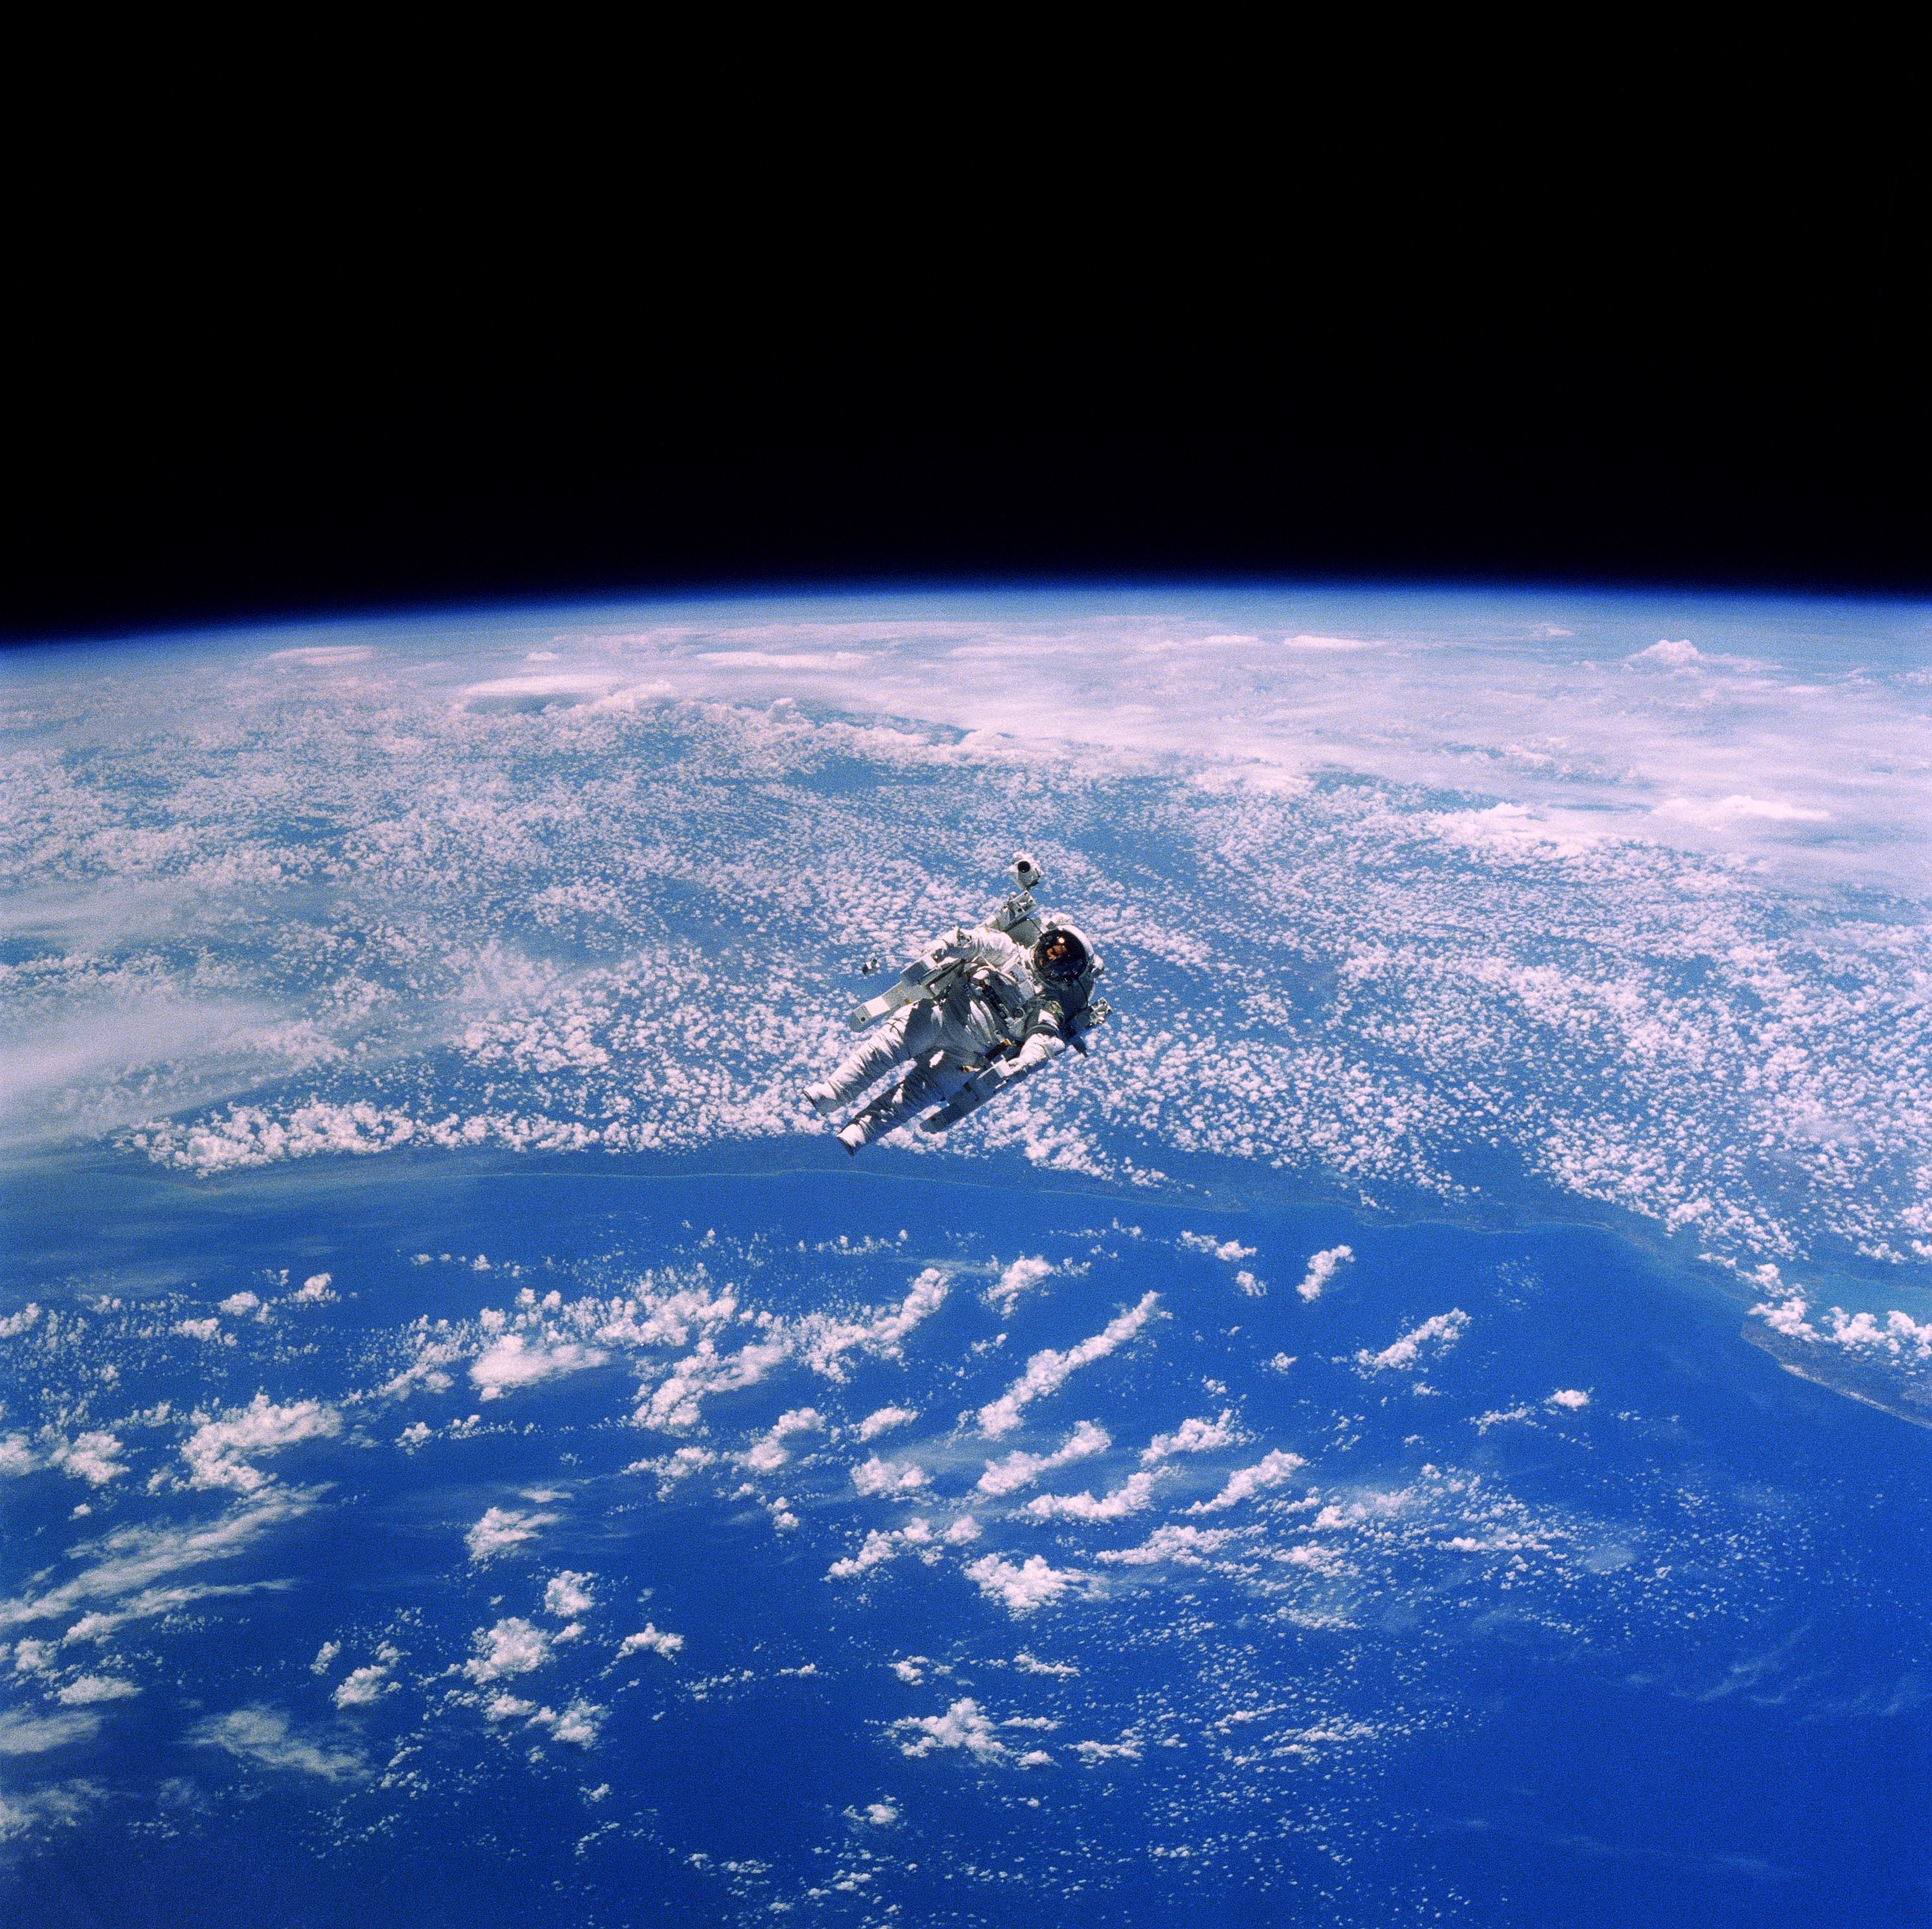 Nasa Sts 41b Mission February 1984 Nasa Astronaut Robert L